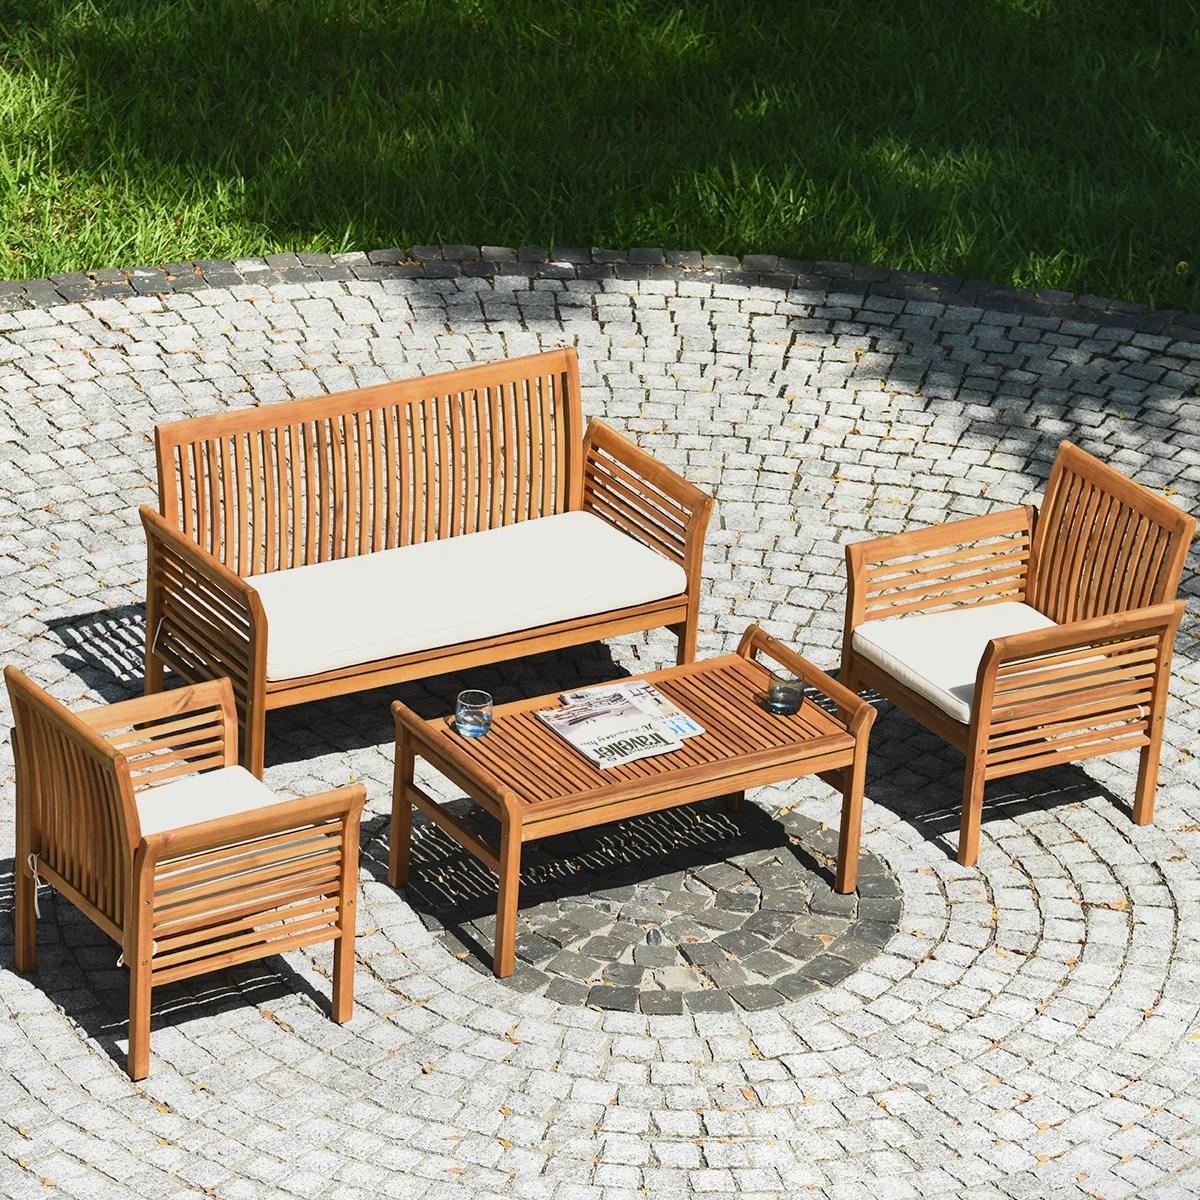 gymax 4pcs wooden patio conversation set outdoor furniture set w cushion walmart com